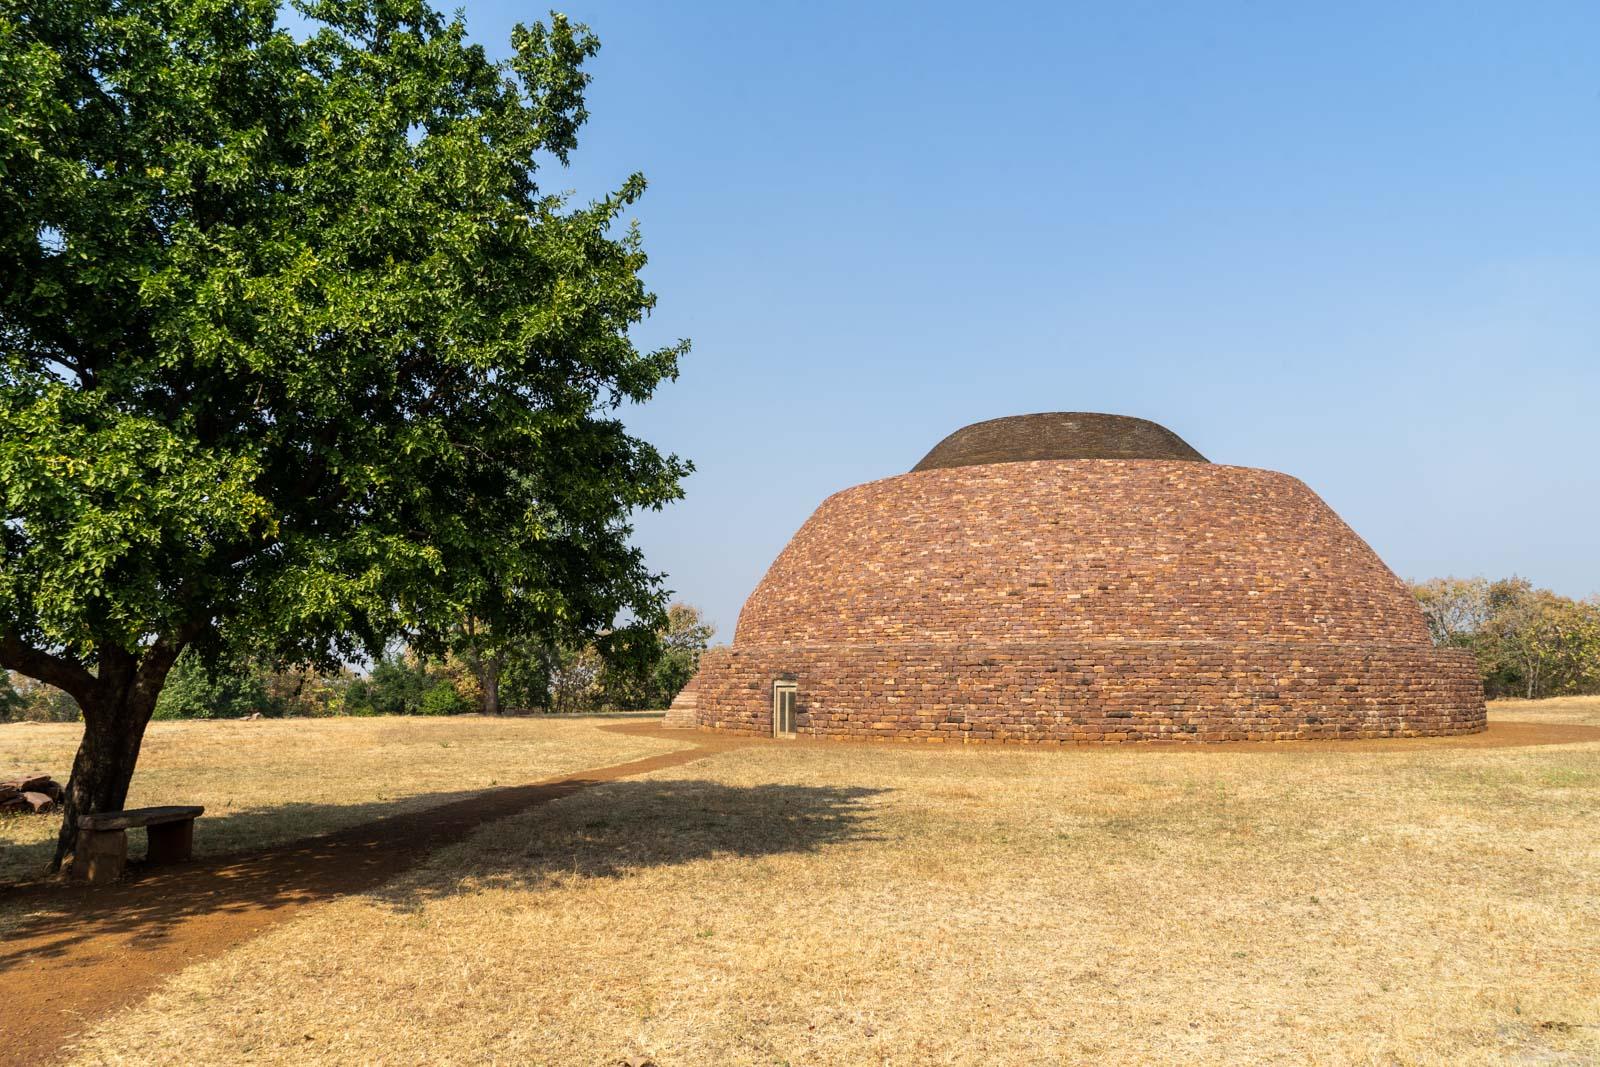 Satdhara Stupa, Sanchi, India